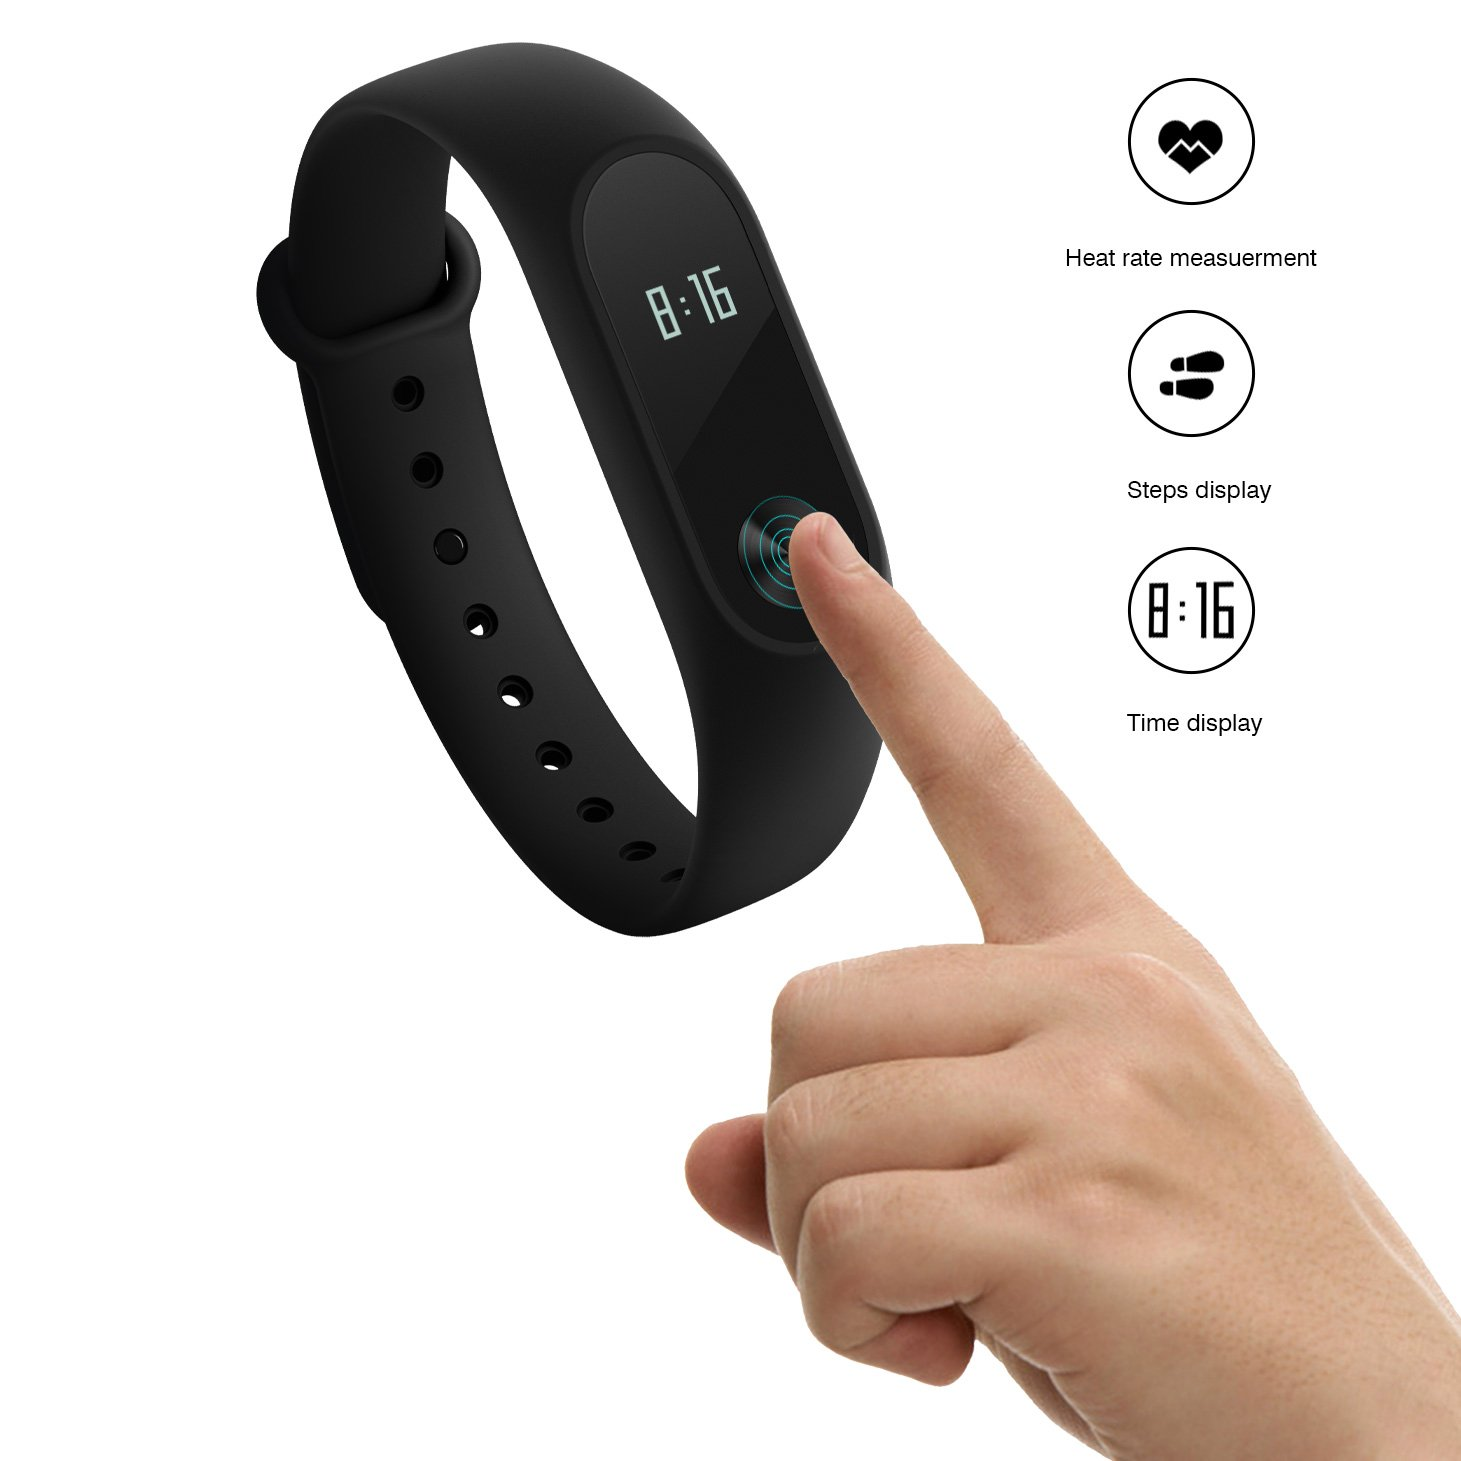 2016 Newly LED Display Mi Band ,Xiaomi Mi Band 2 With LED Display Touchpad Smart Heart Rate Monitor Fitness Tracker Pedometer Waterproof Wireless Bluetooth 4.0 Wristband